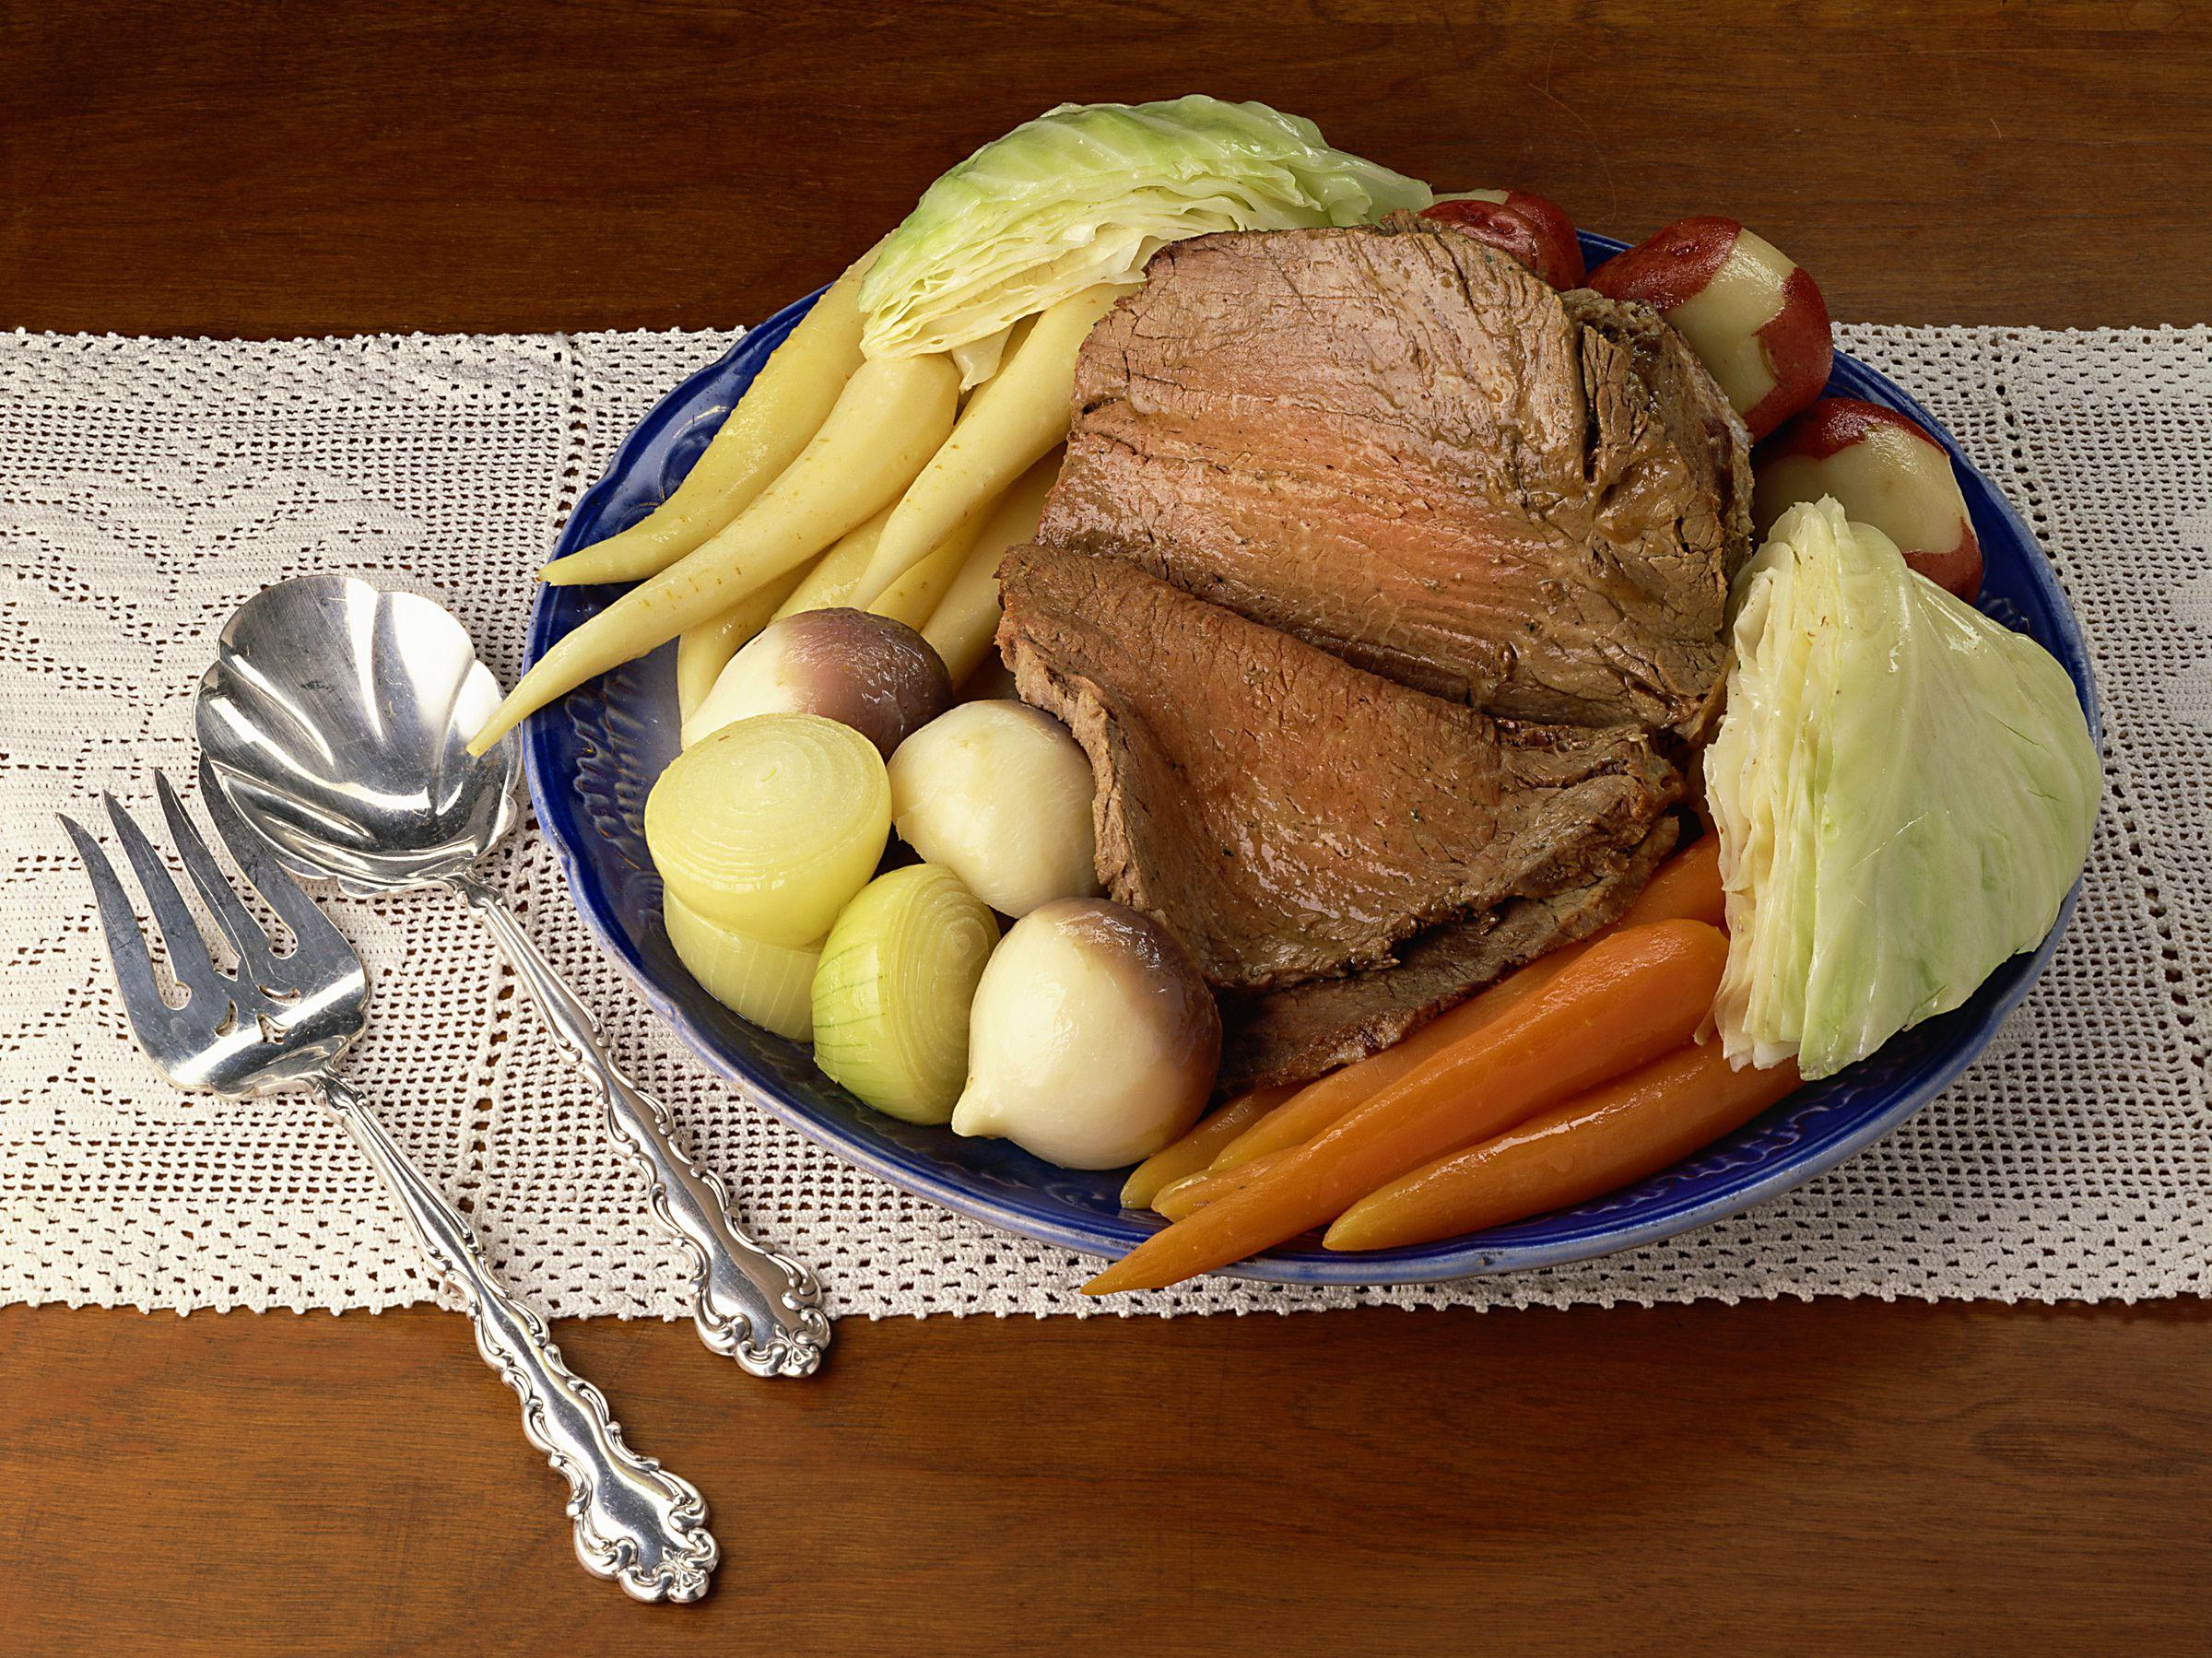 irish boiled dinner recipe, beef, potatoes, cabbage, st patricks day, receipts